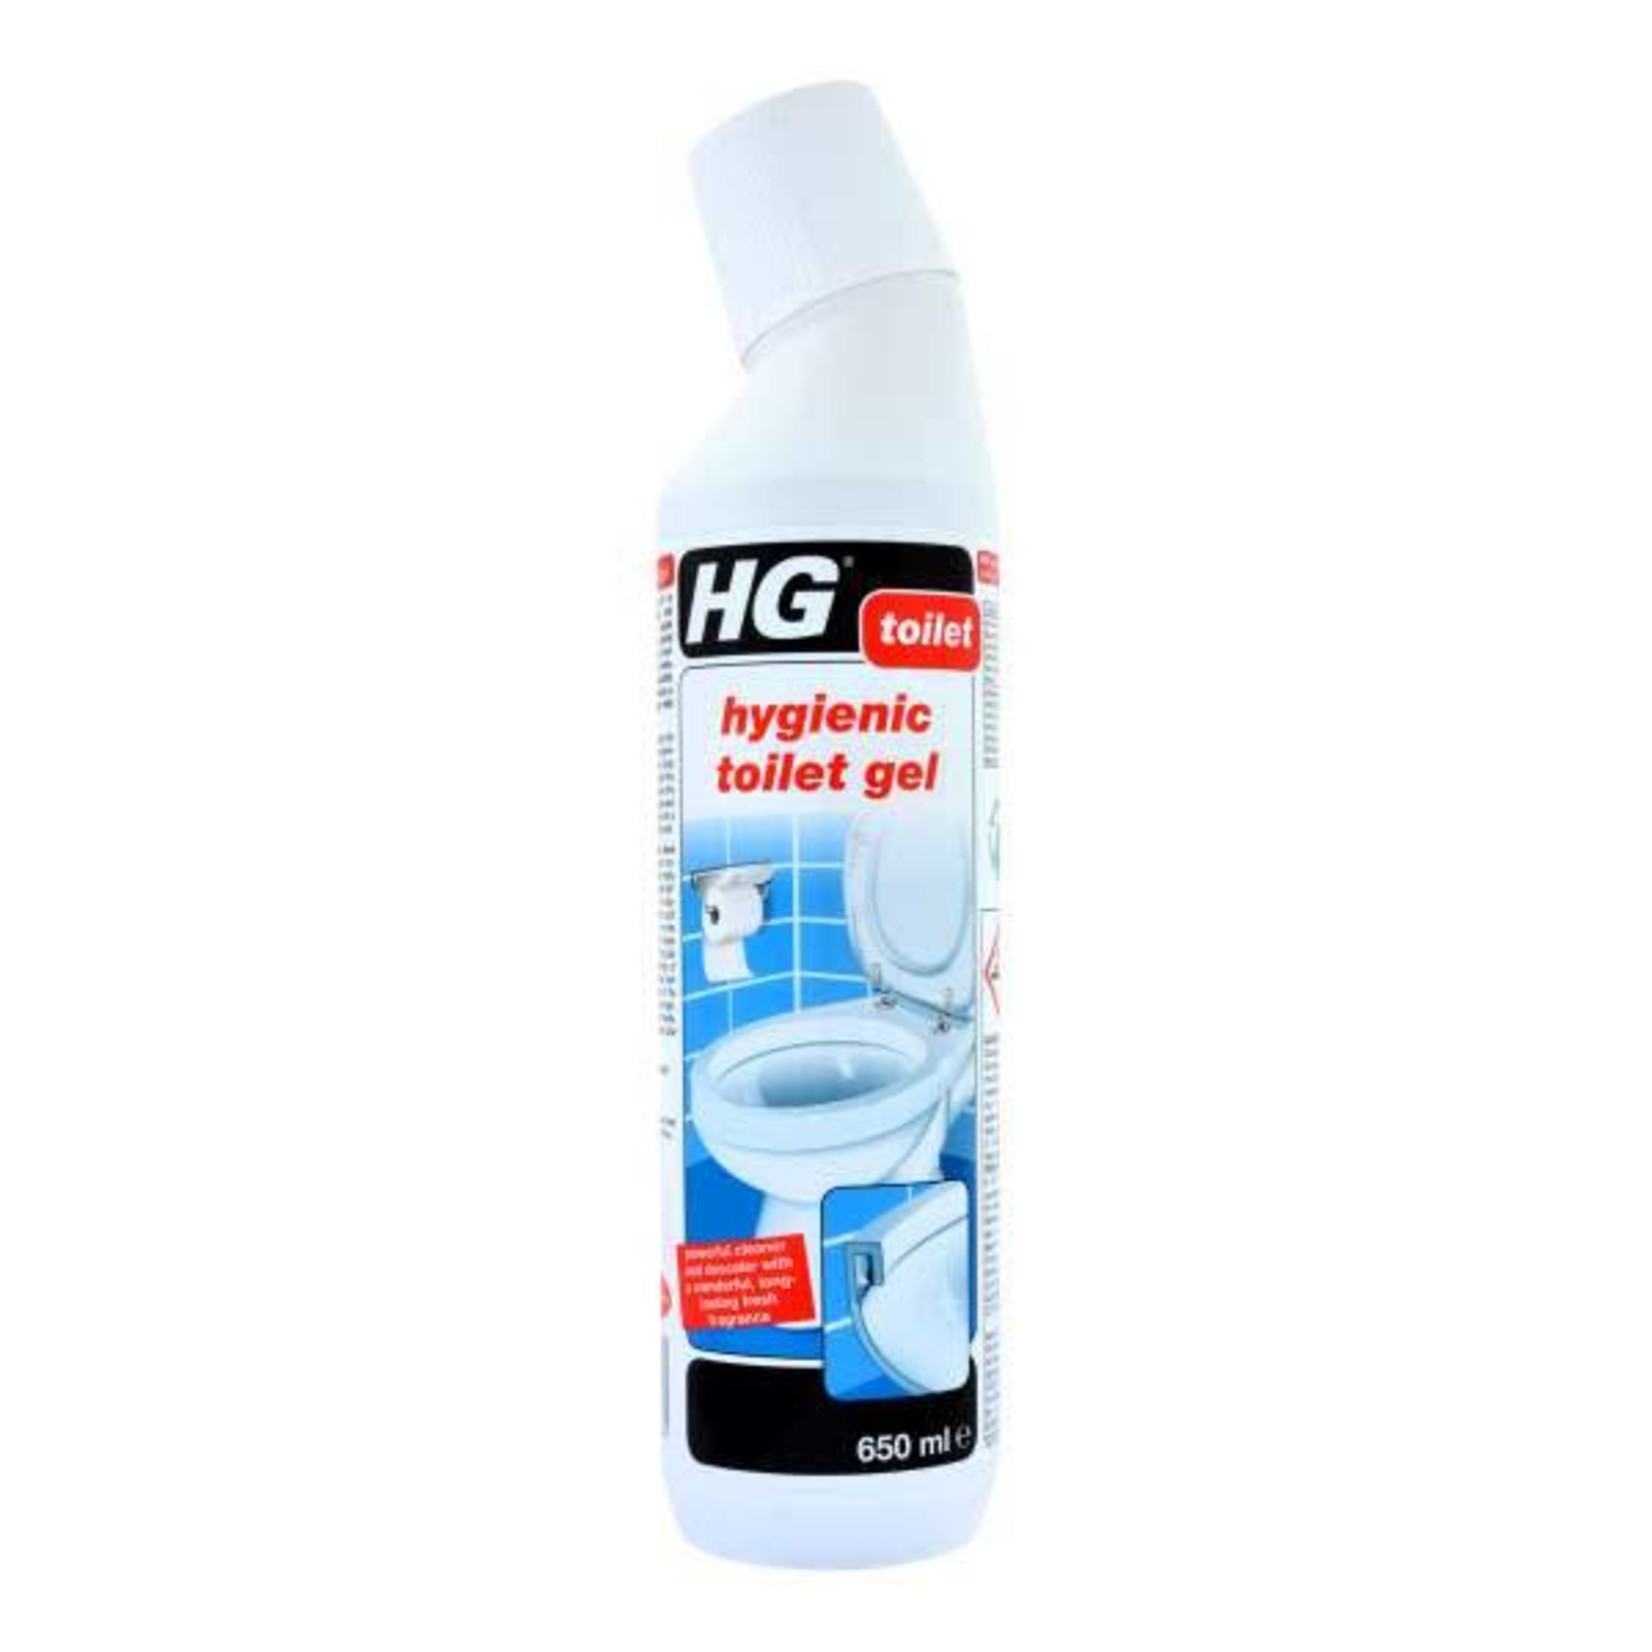 HG HG HYGIENIC TOILET GEL